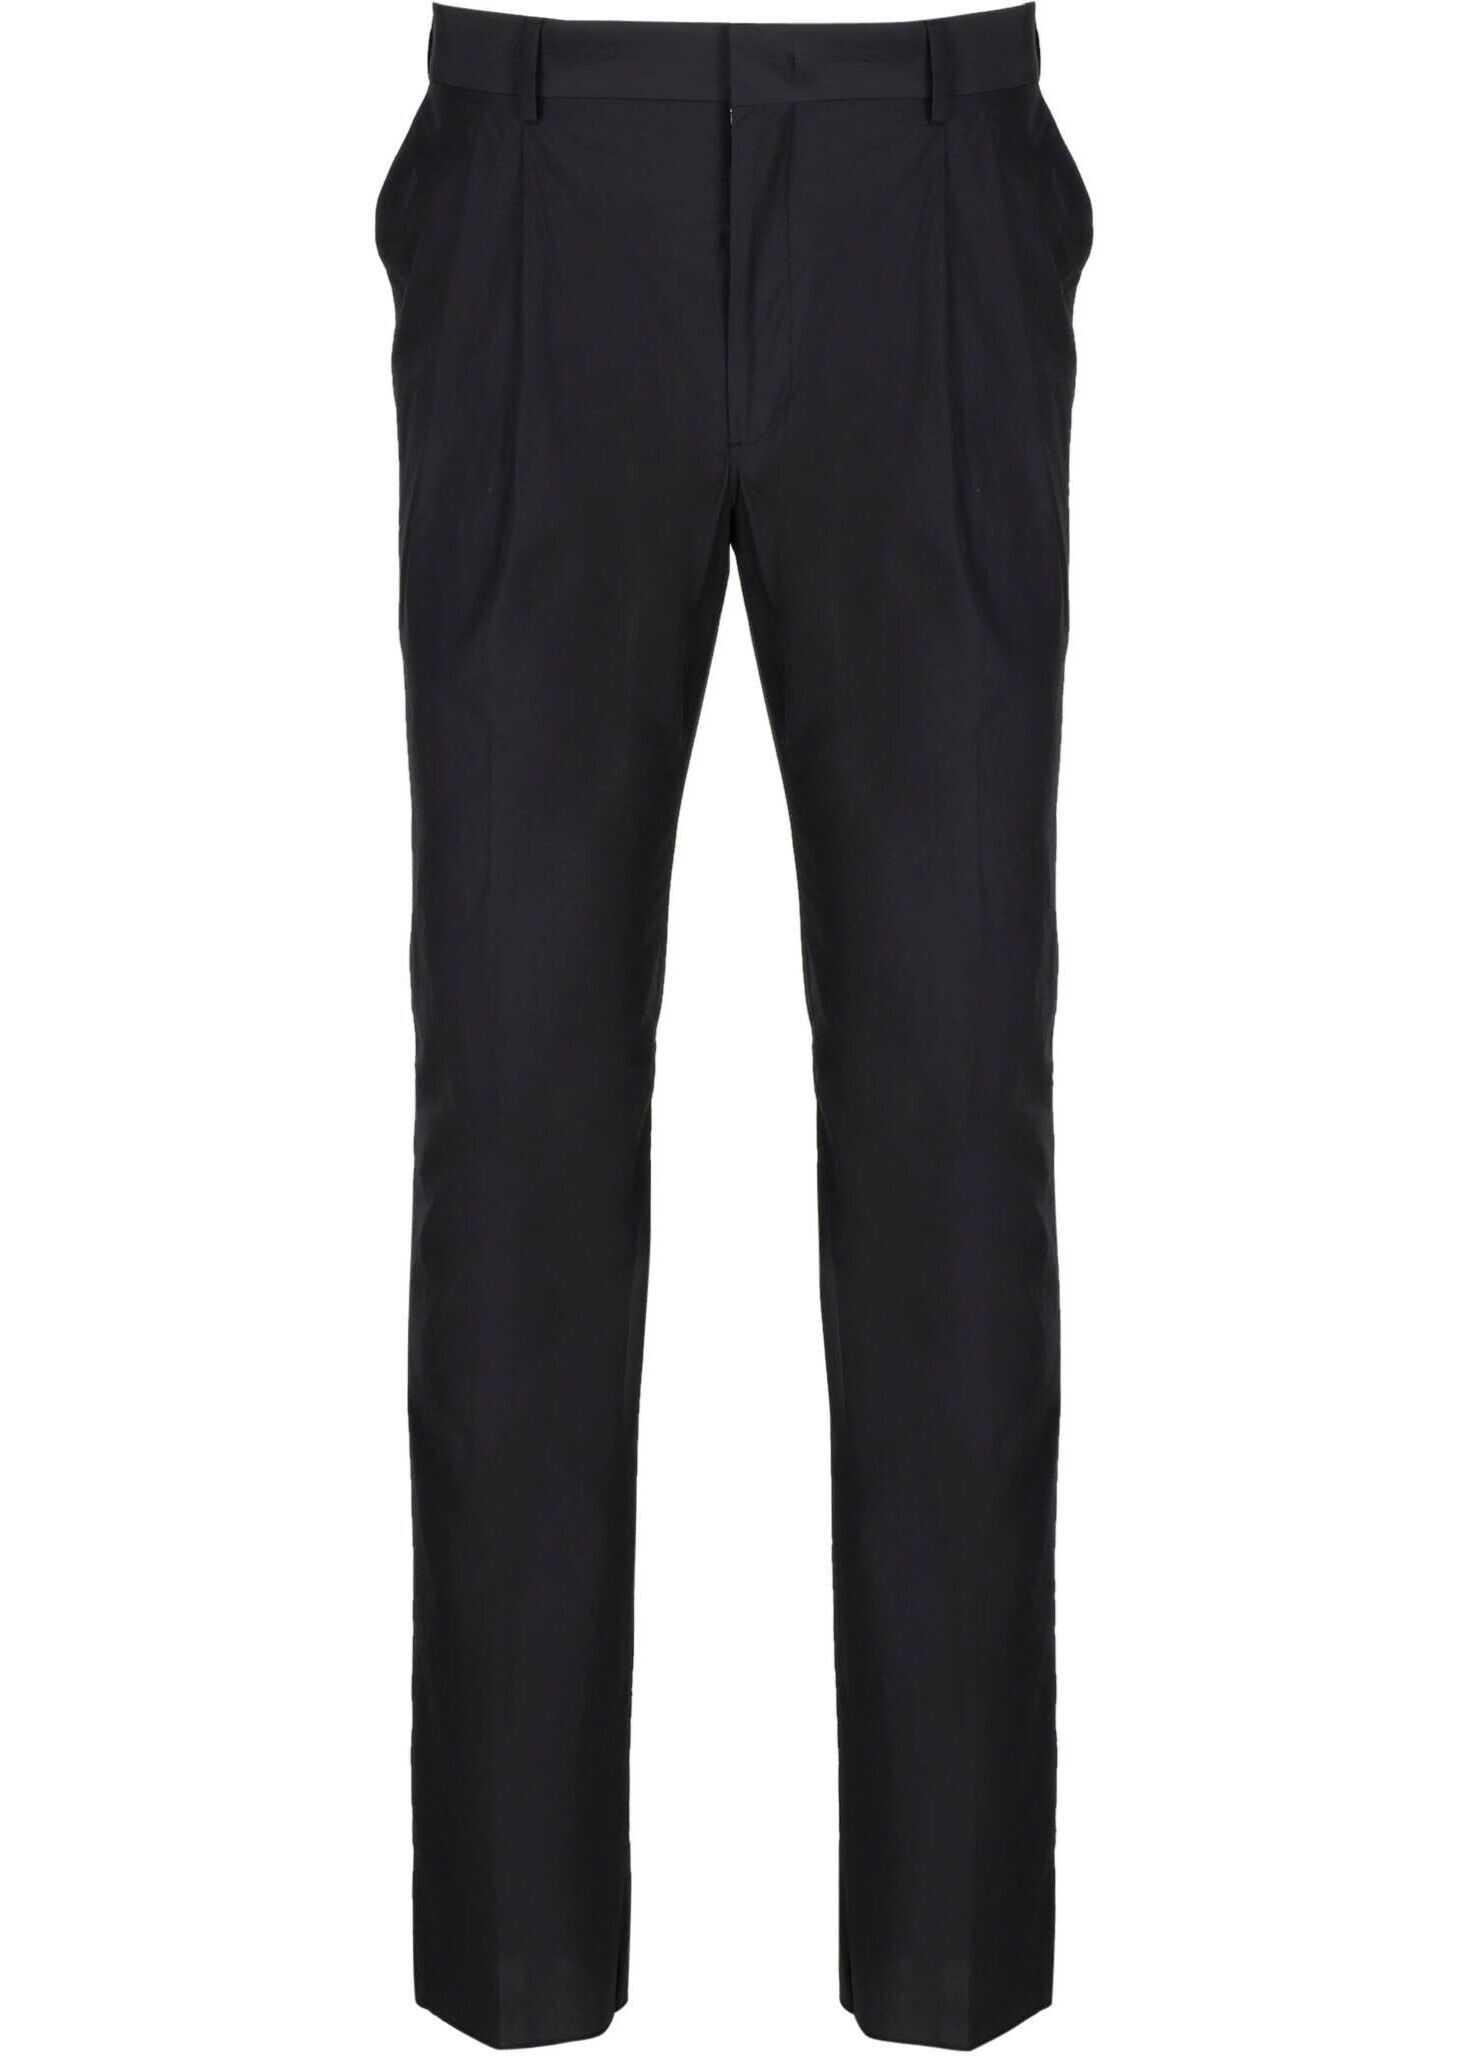 Fendi Cotton Pants BLACK